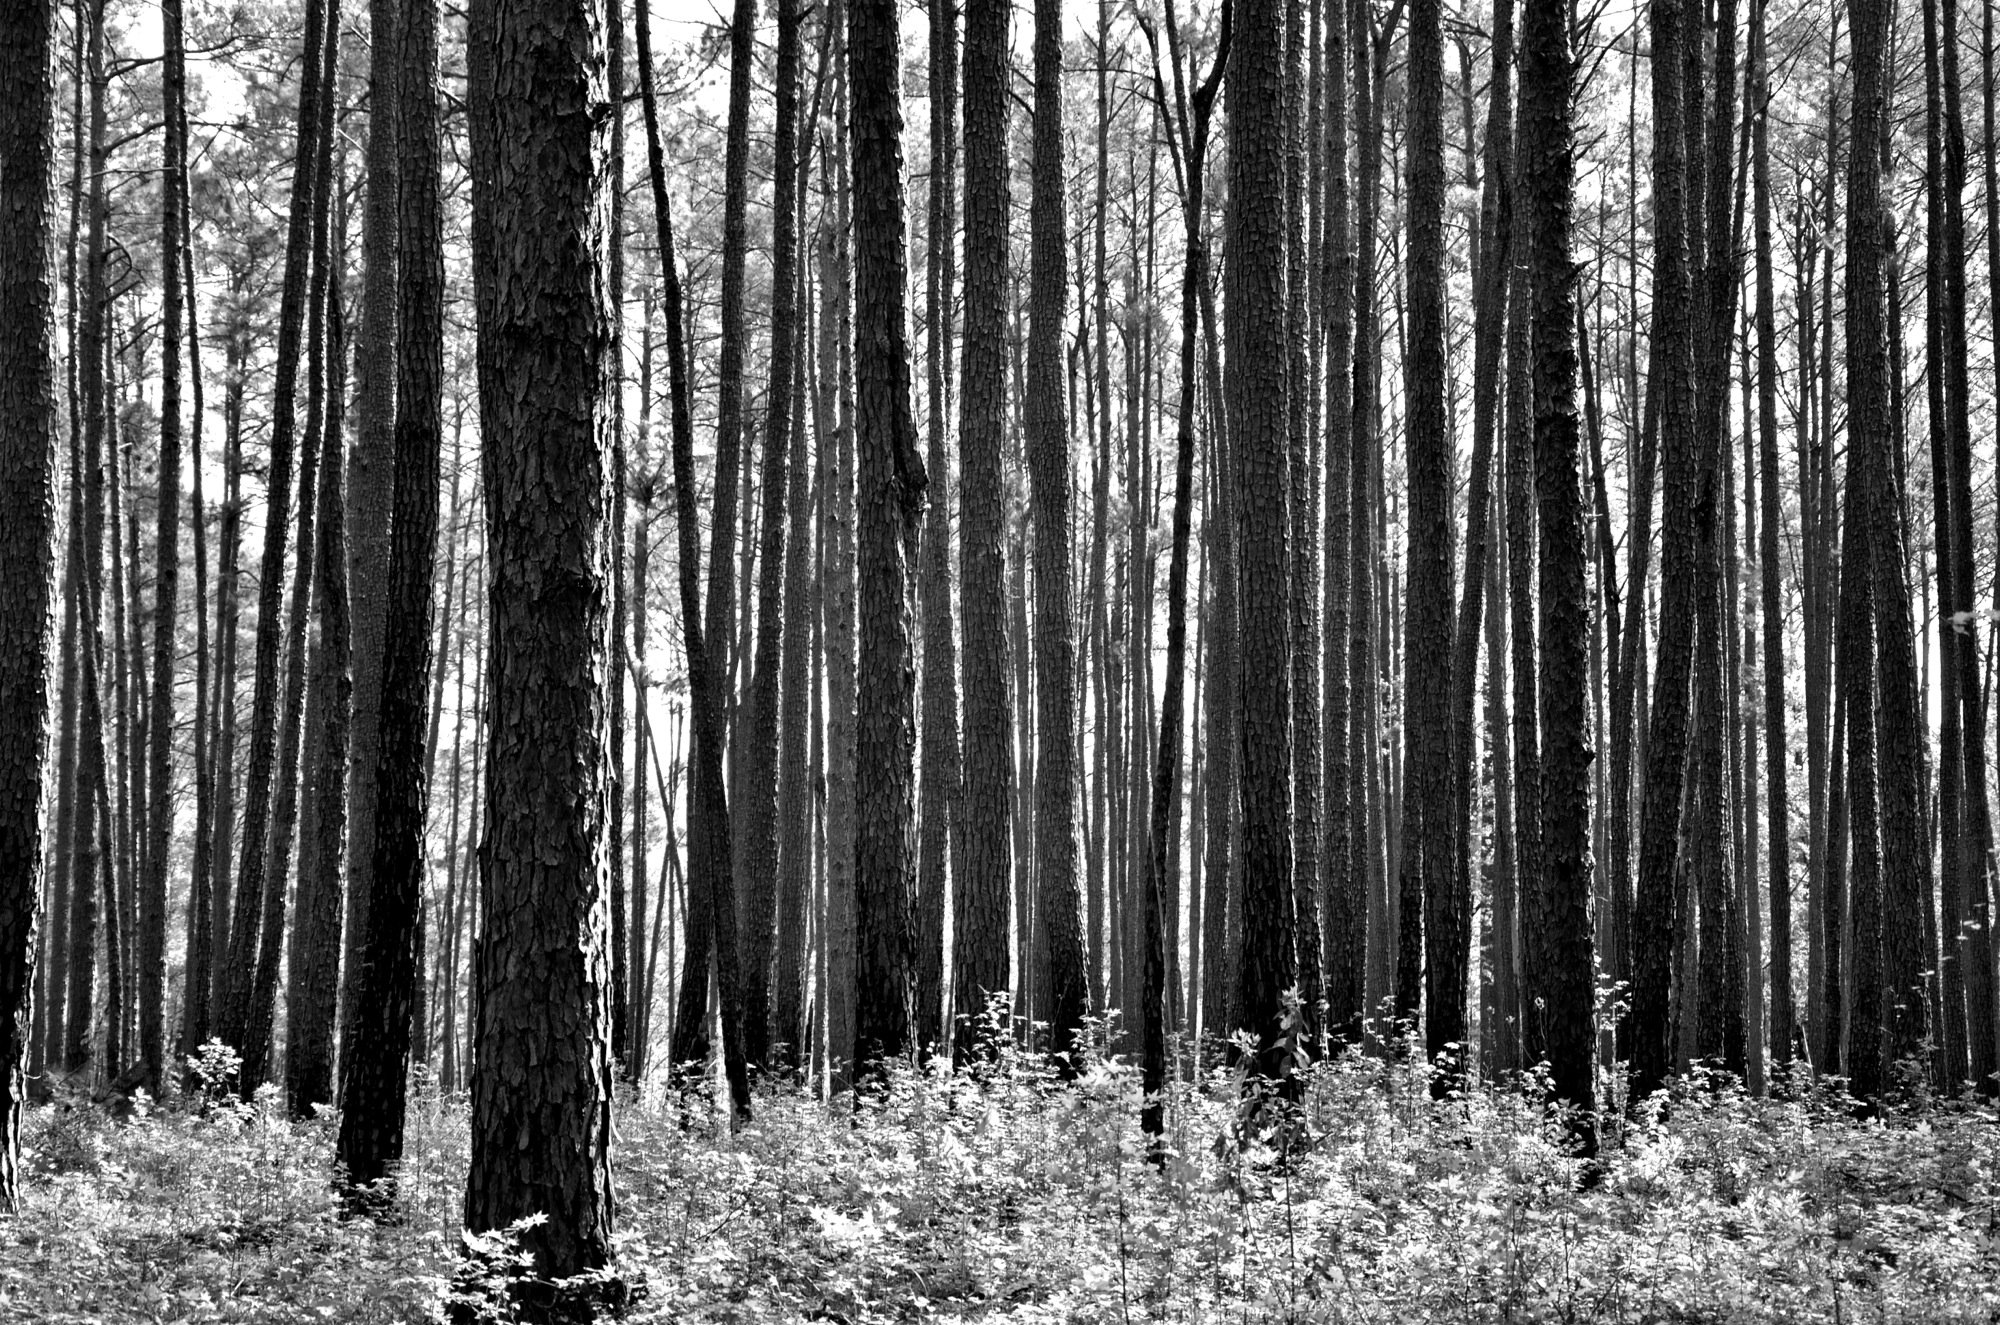 Congaree Pines